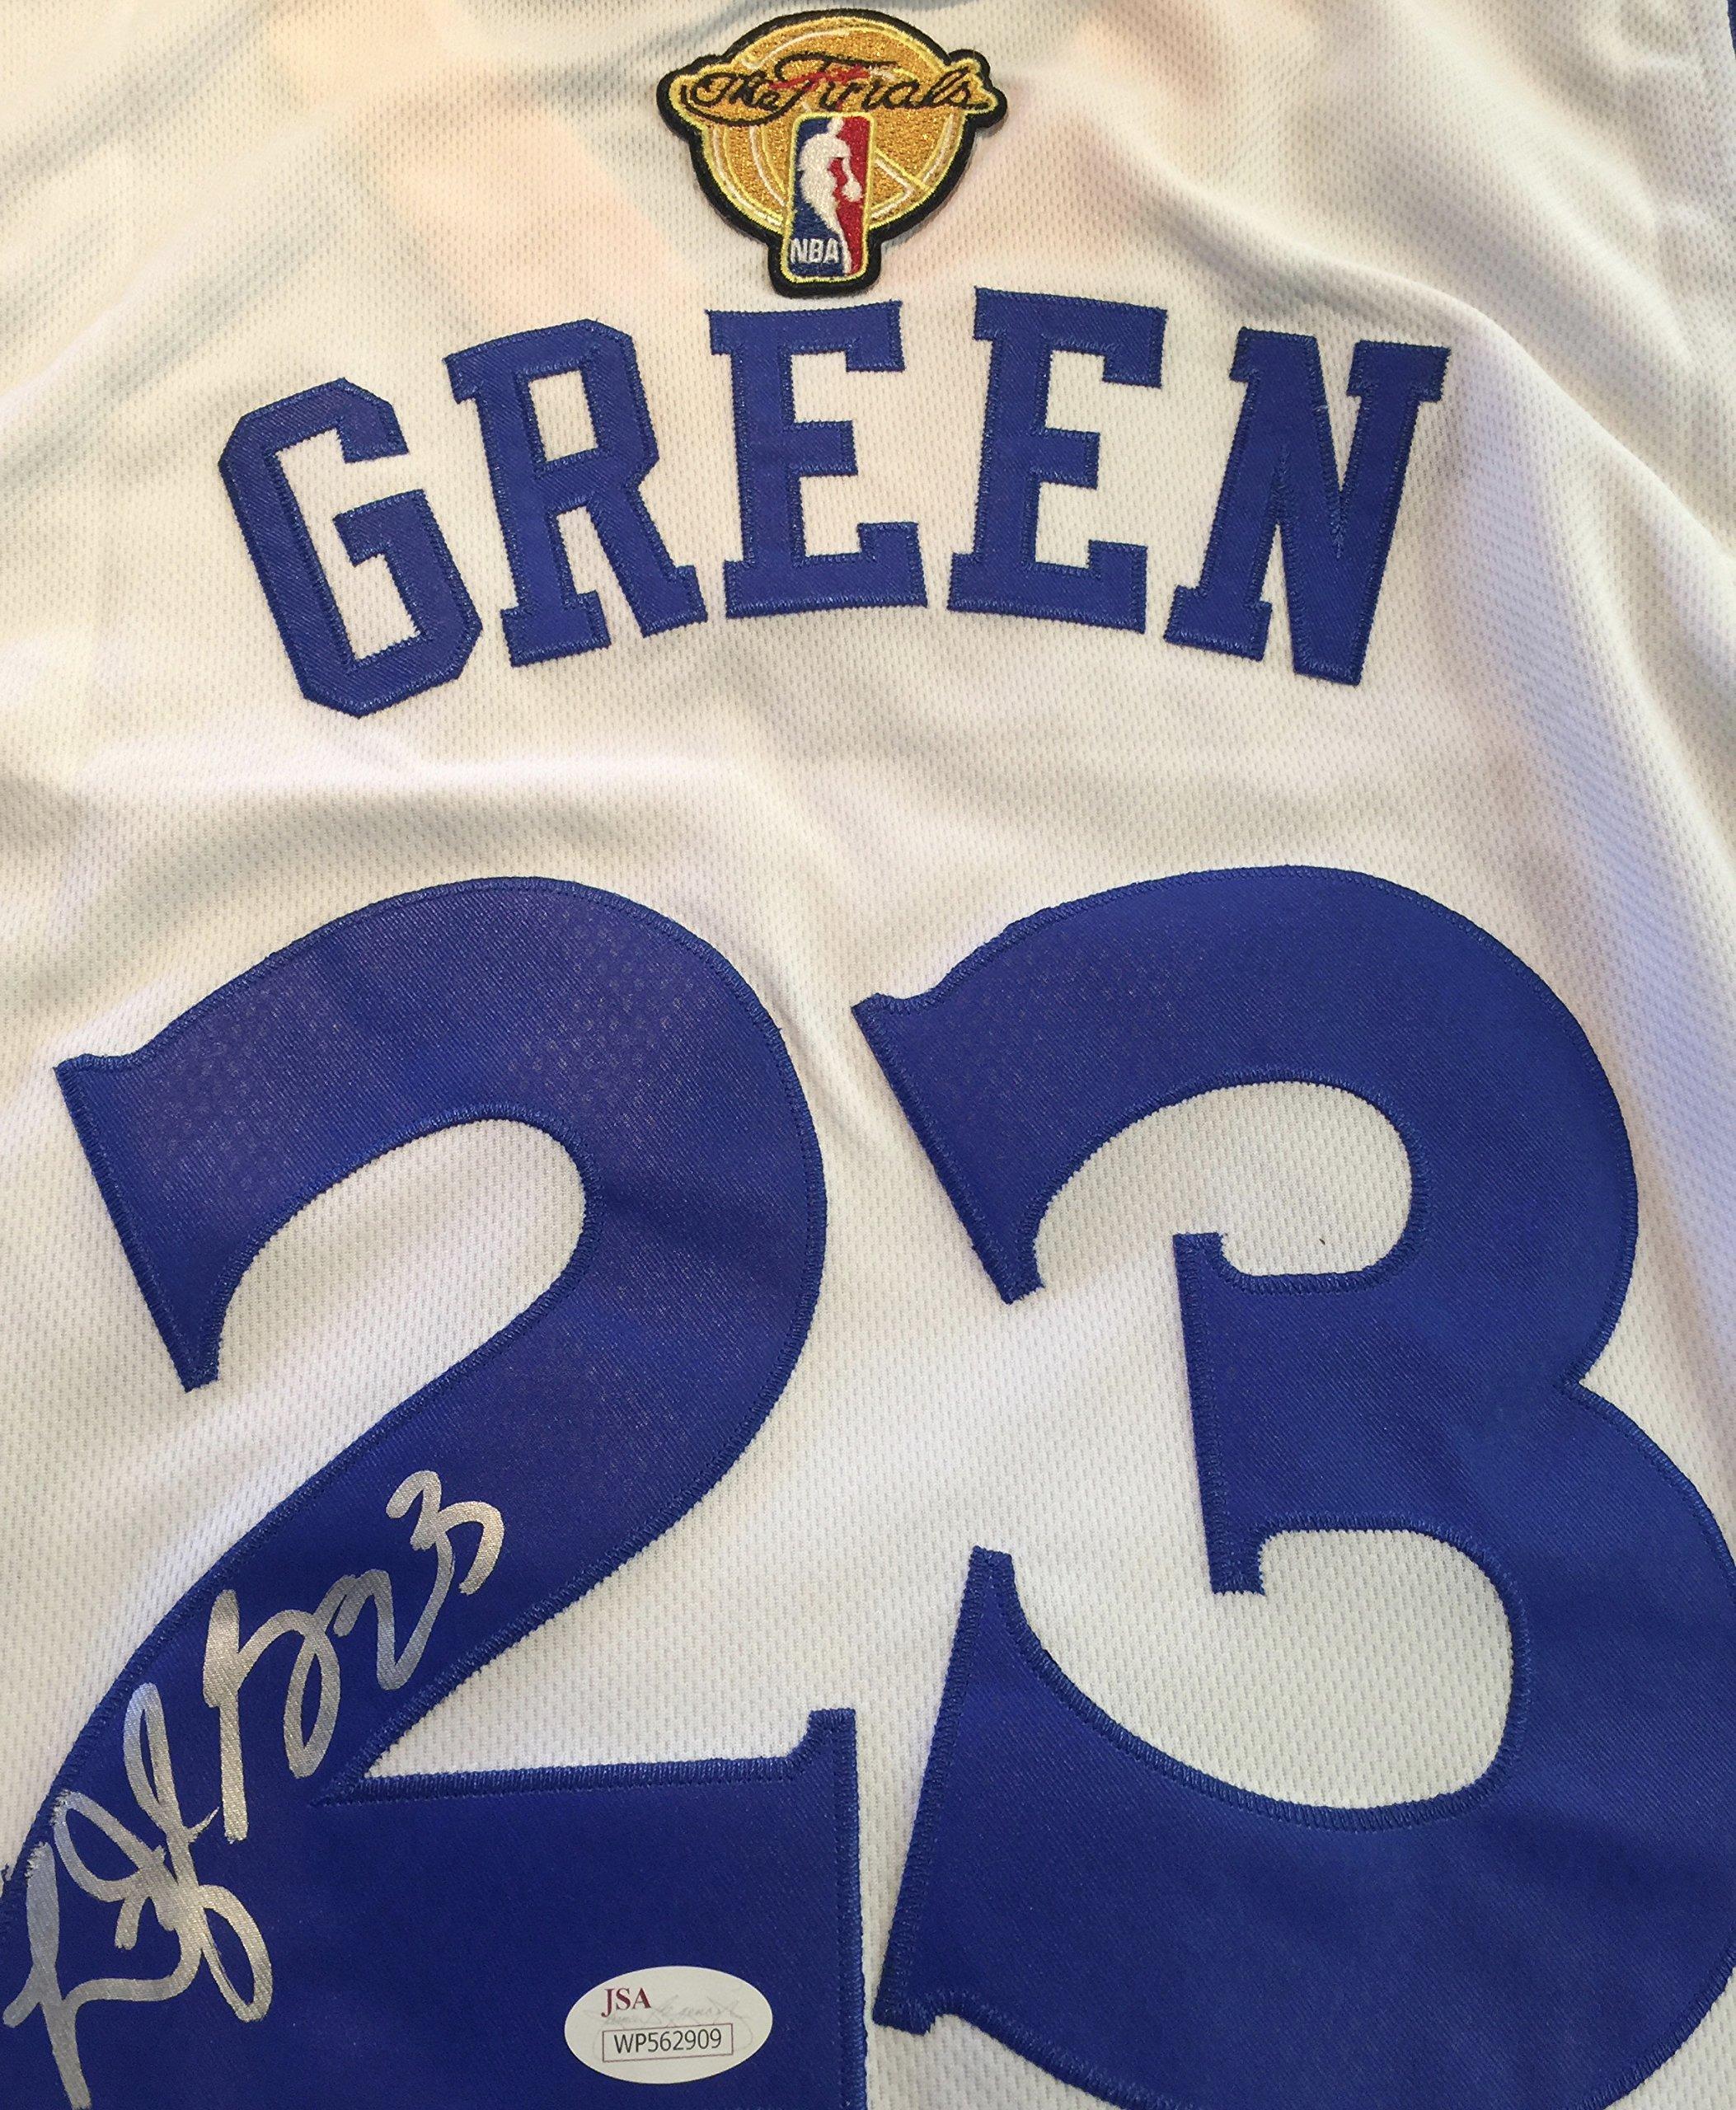 Draymond Green GSW Signed White Jersey JSA WP Certified Autographed NBA Jersey by Draymond Green